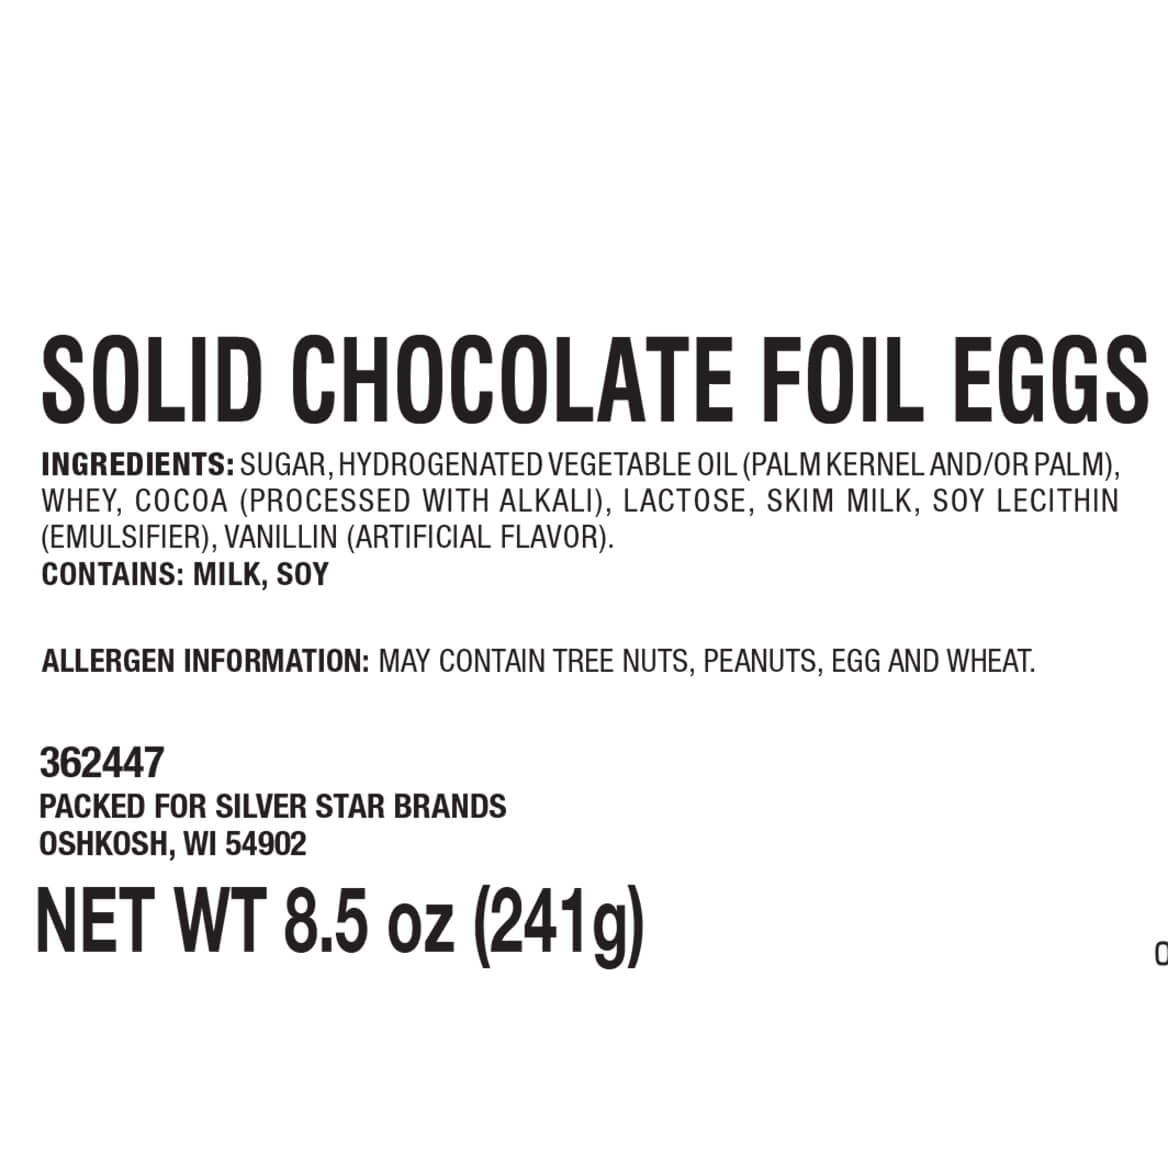 Solid Chocolate Foil Eggs, 8.5 oz.-362447